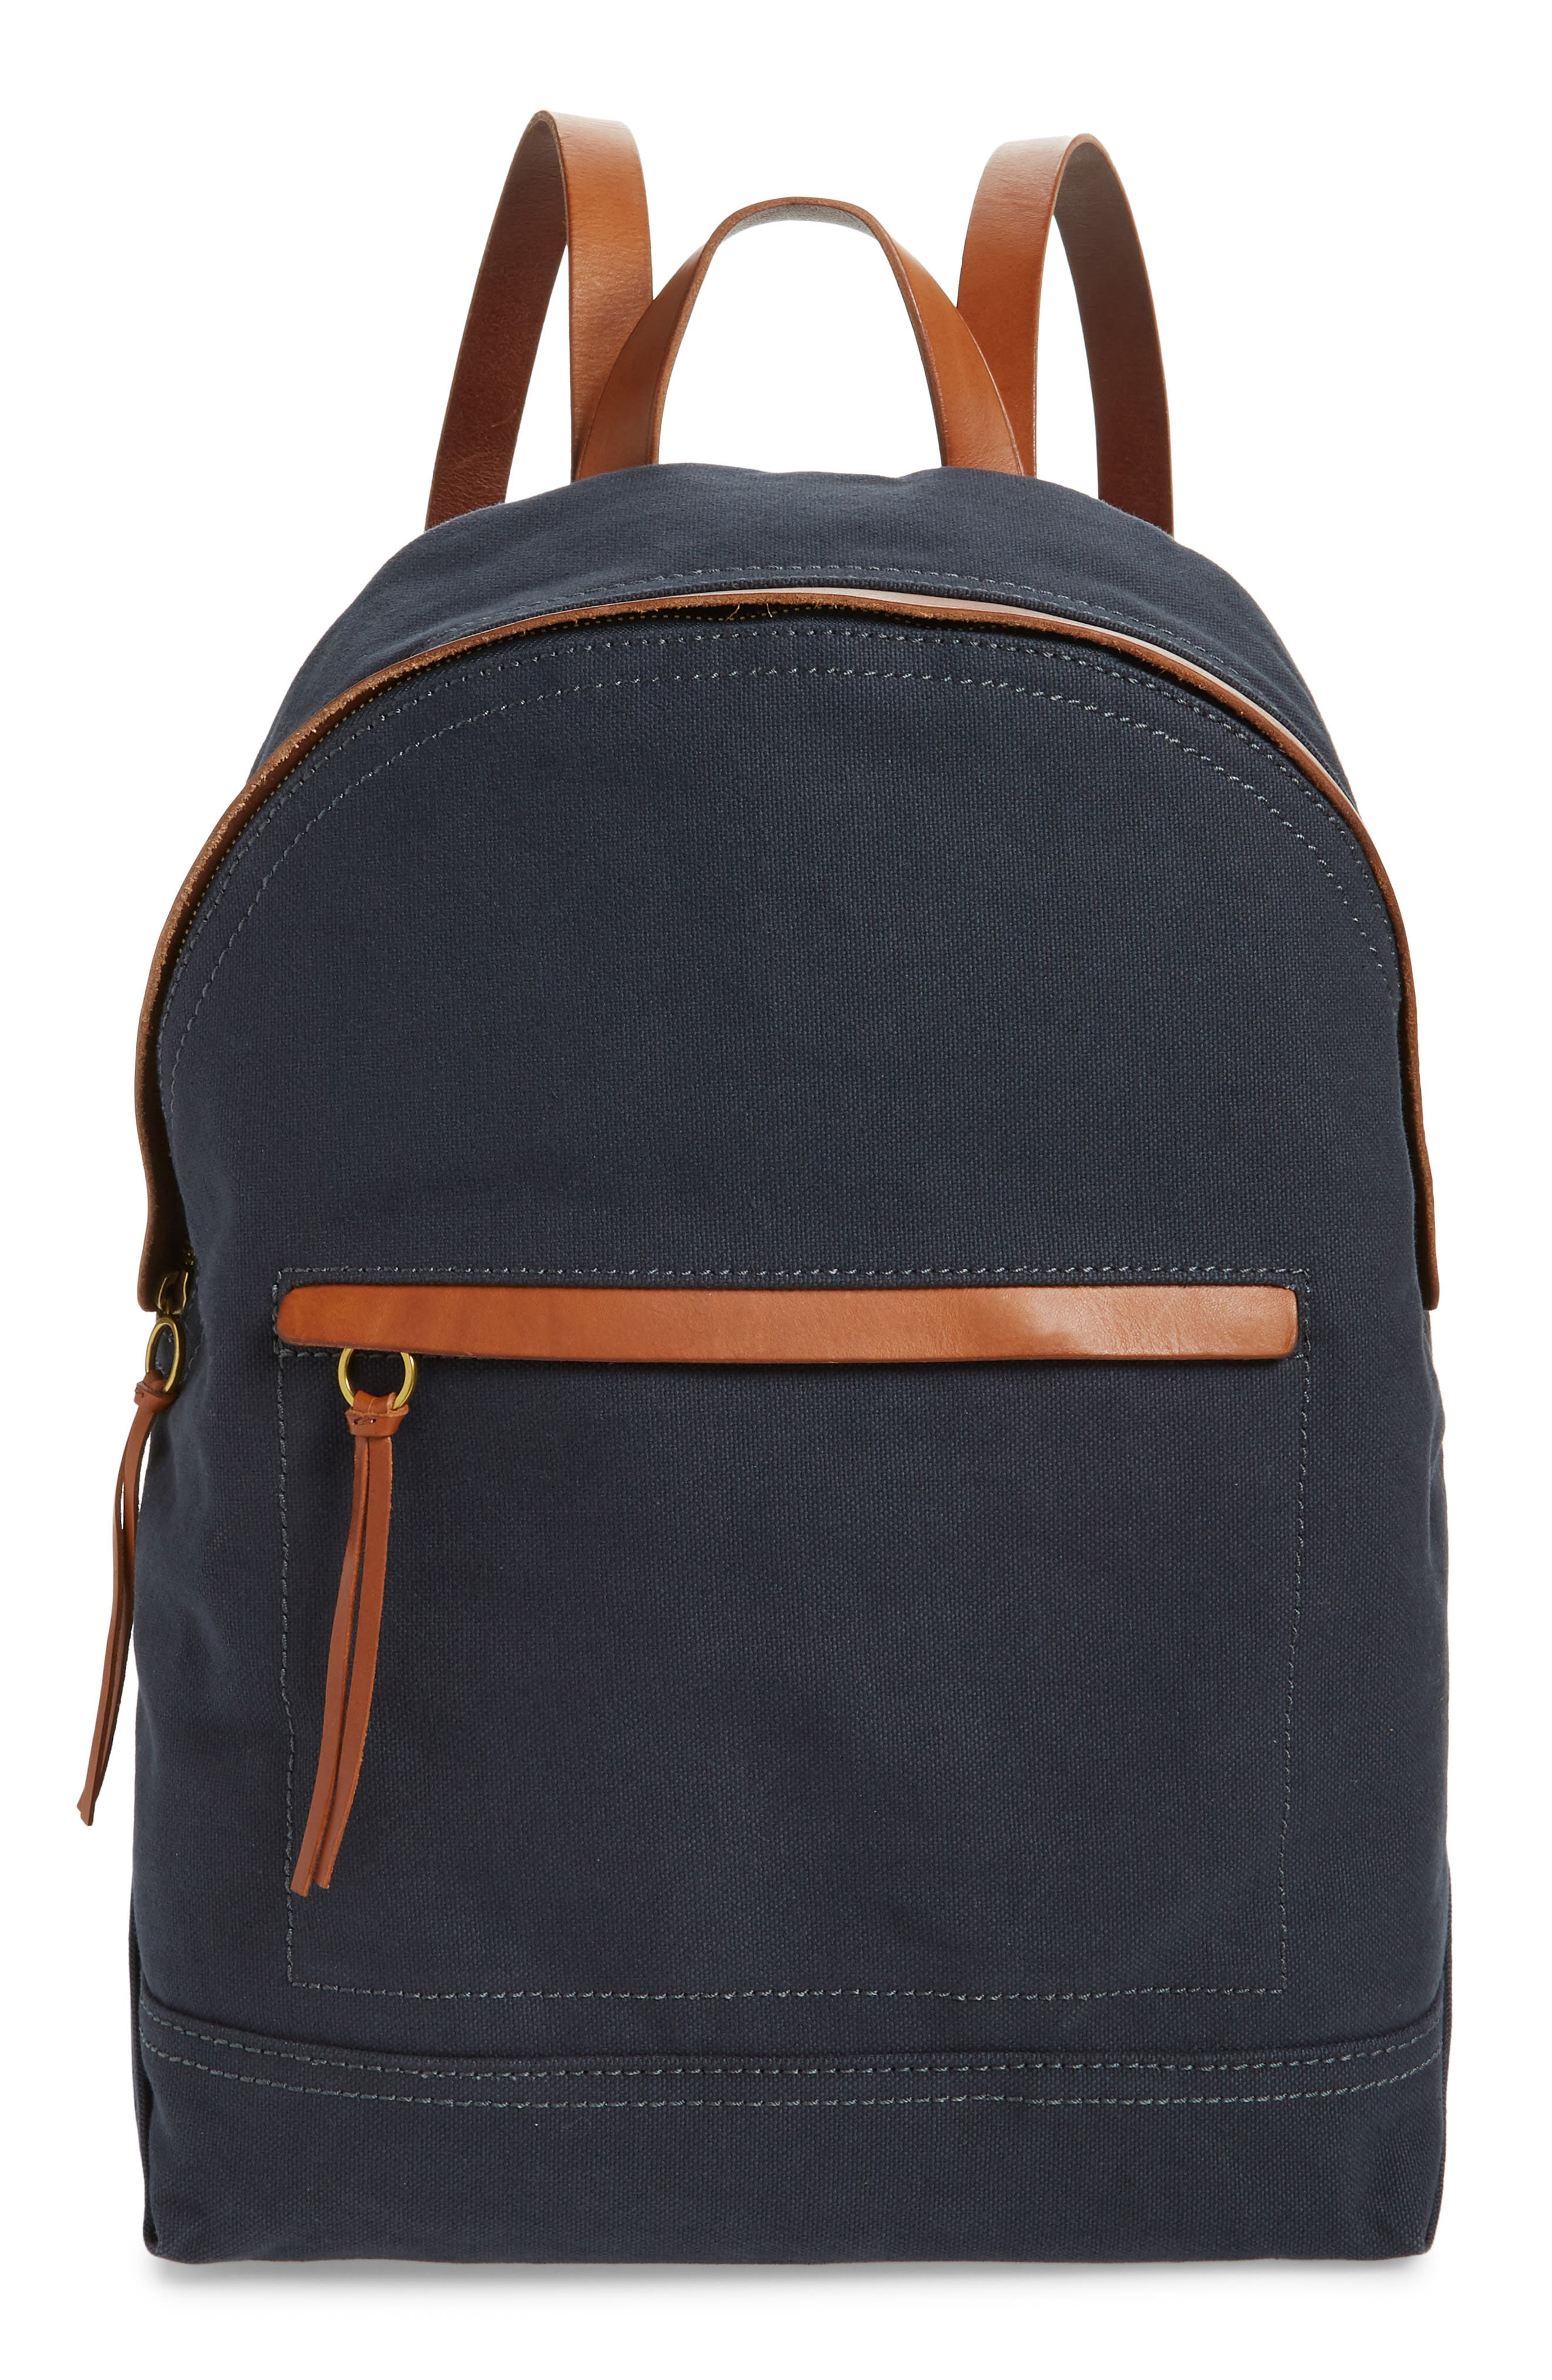 MADEWELL The Charleston Backpack, Main, color, BLACK SEA